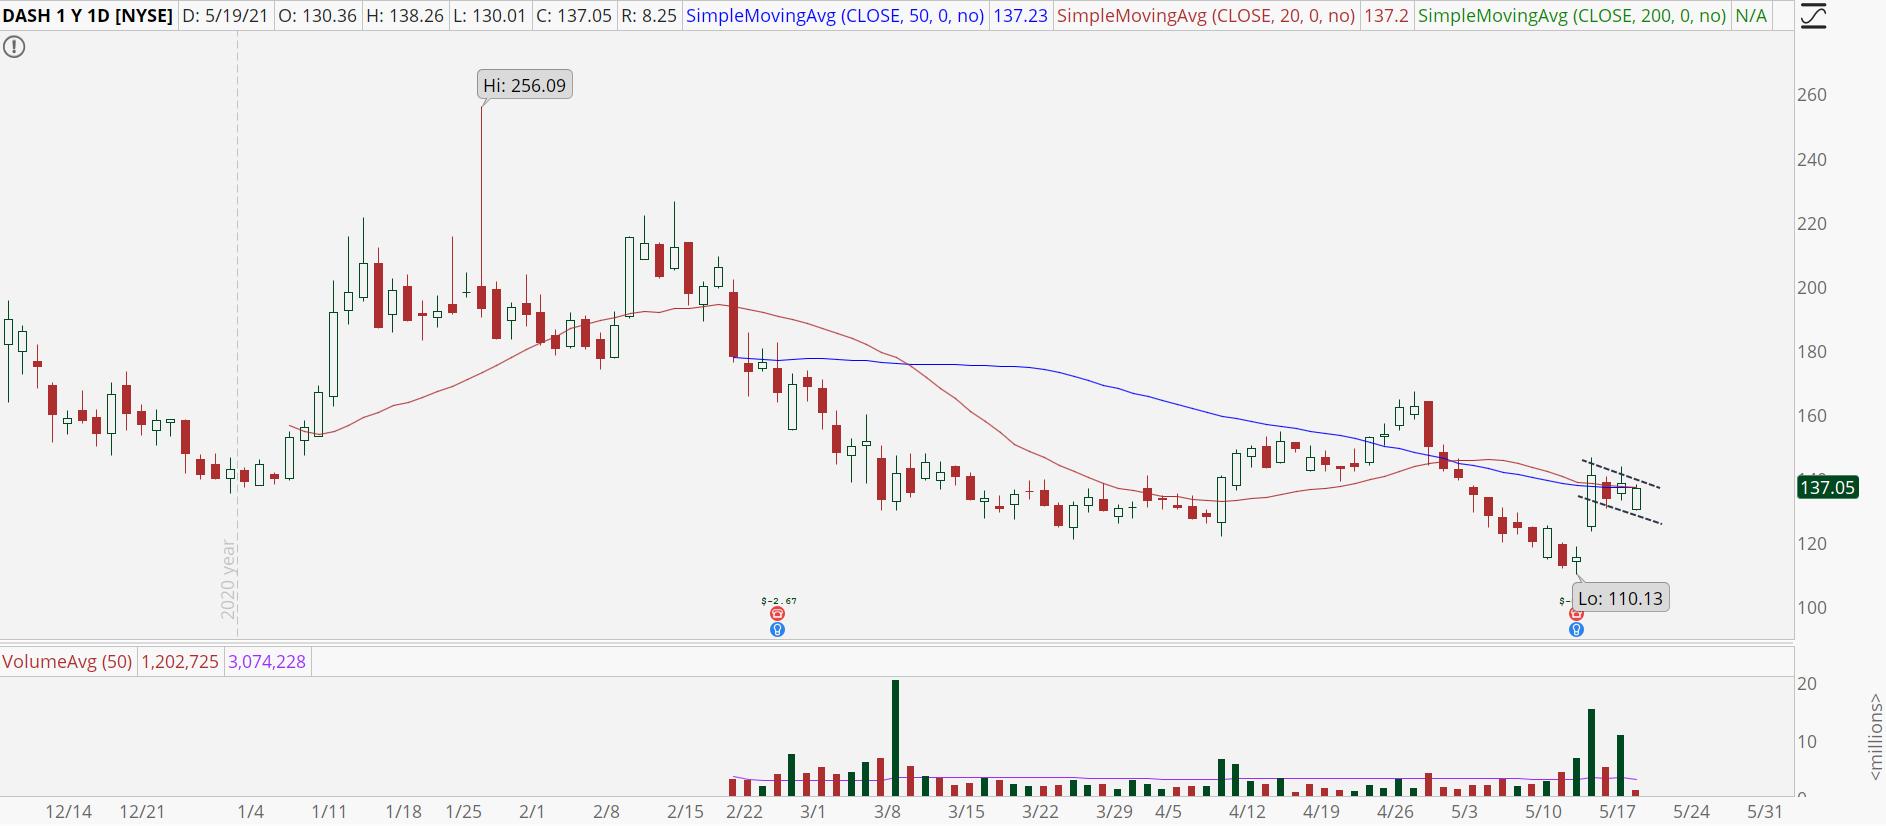 DoorDash (DASH) stock with post-earnings pop